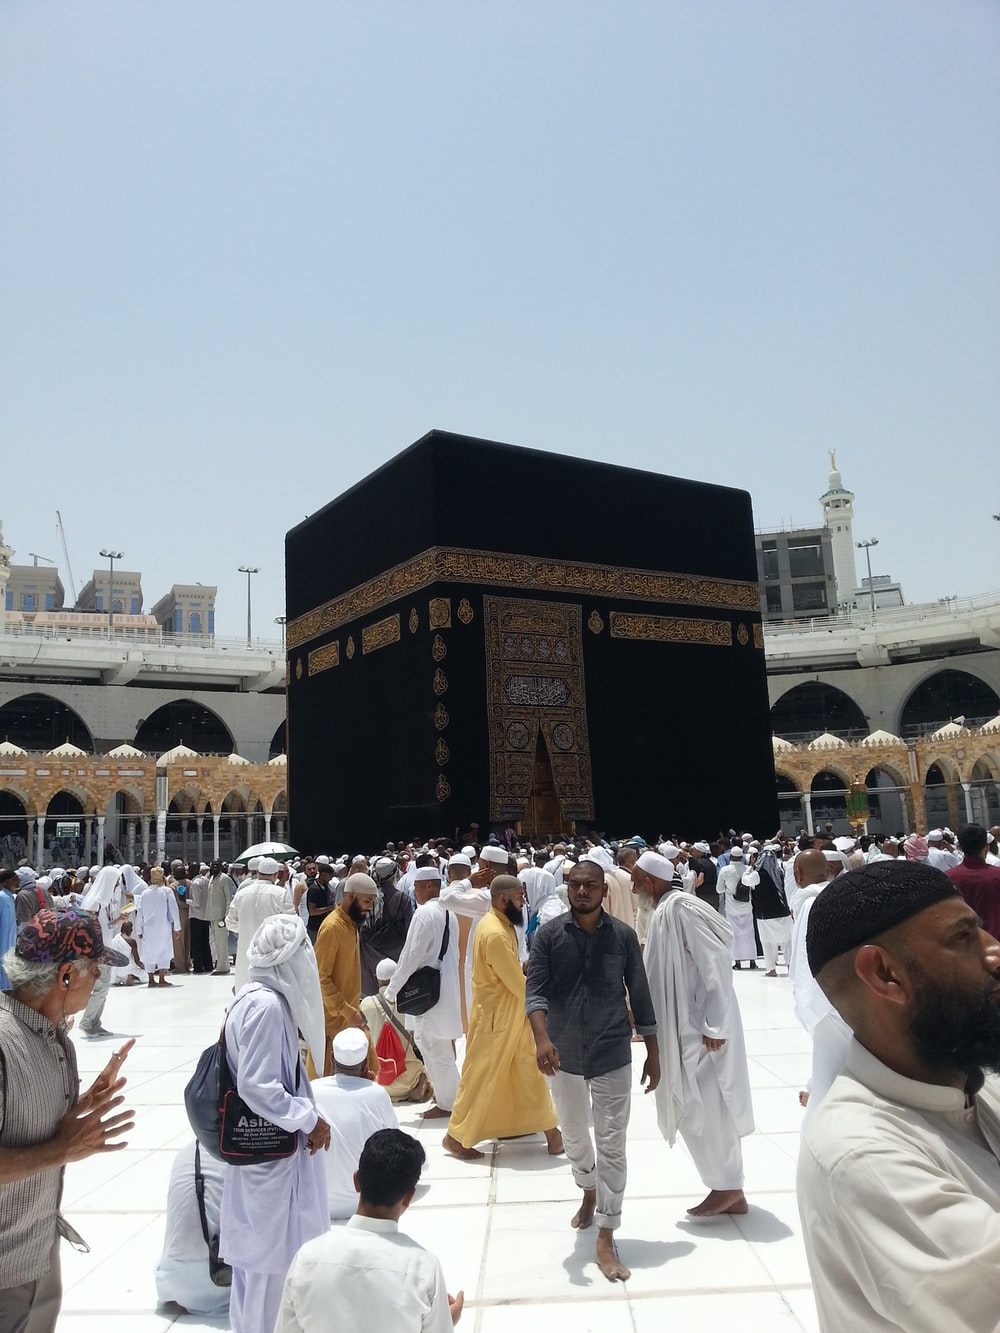 photography of people gathering near Kaaba, Mecca, Saudi Arabia during daytime